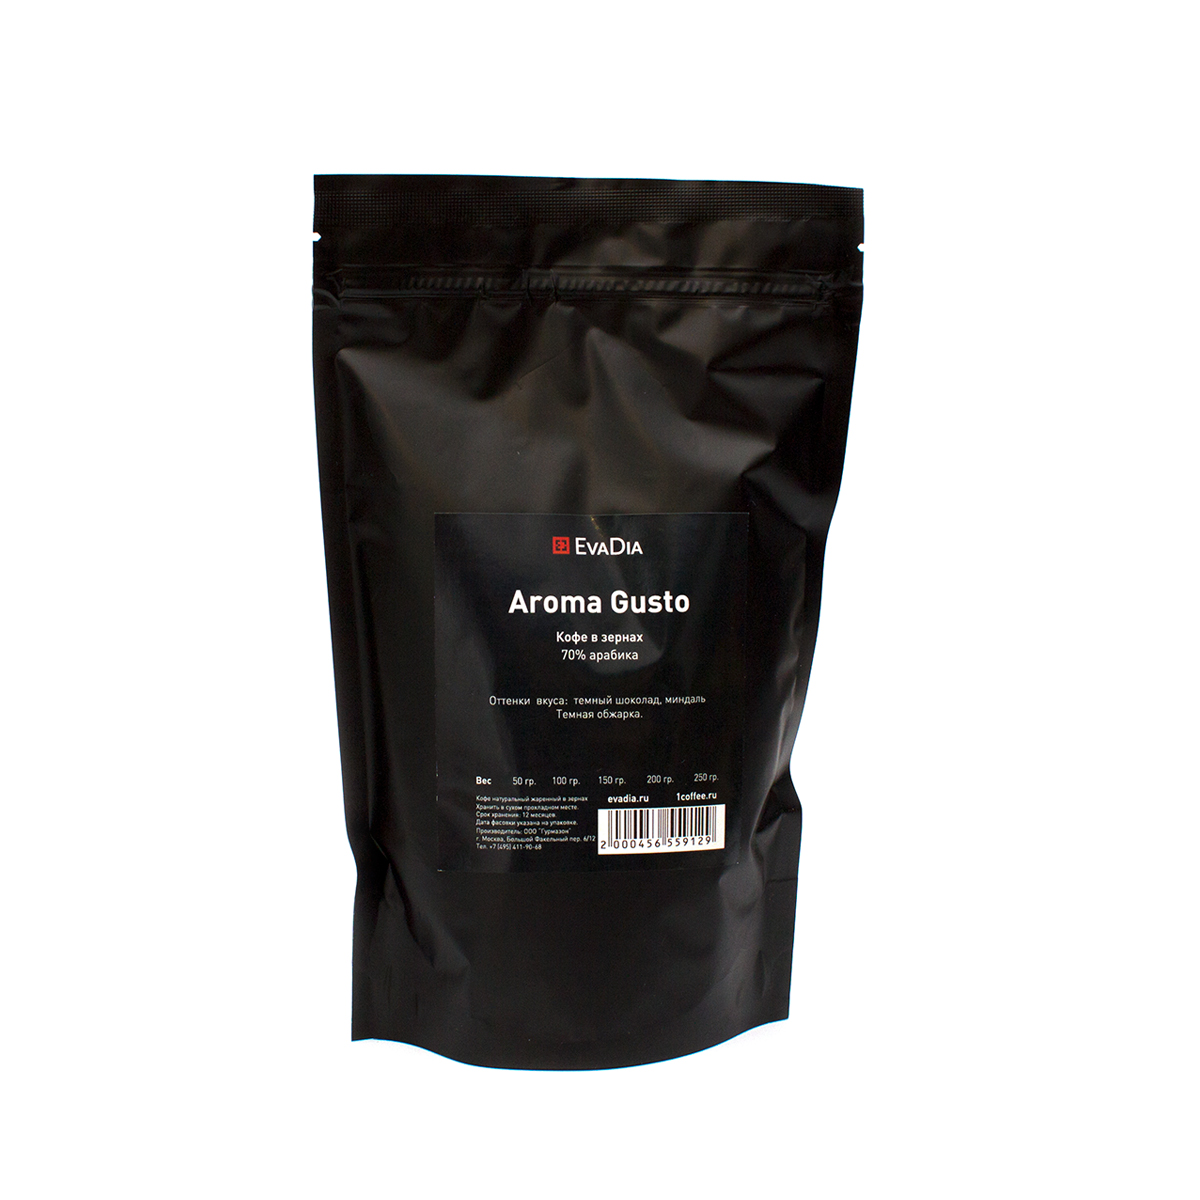 Кофе EvaDia «AROMA GUSTO», 70% арабика, 250 грамм